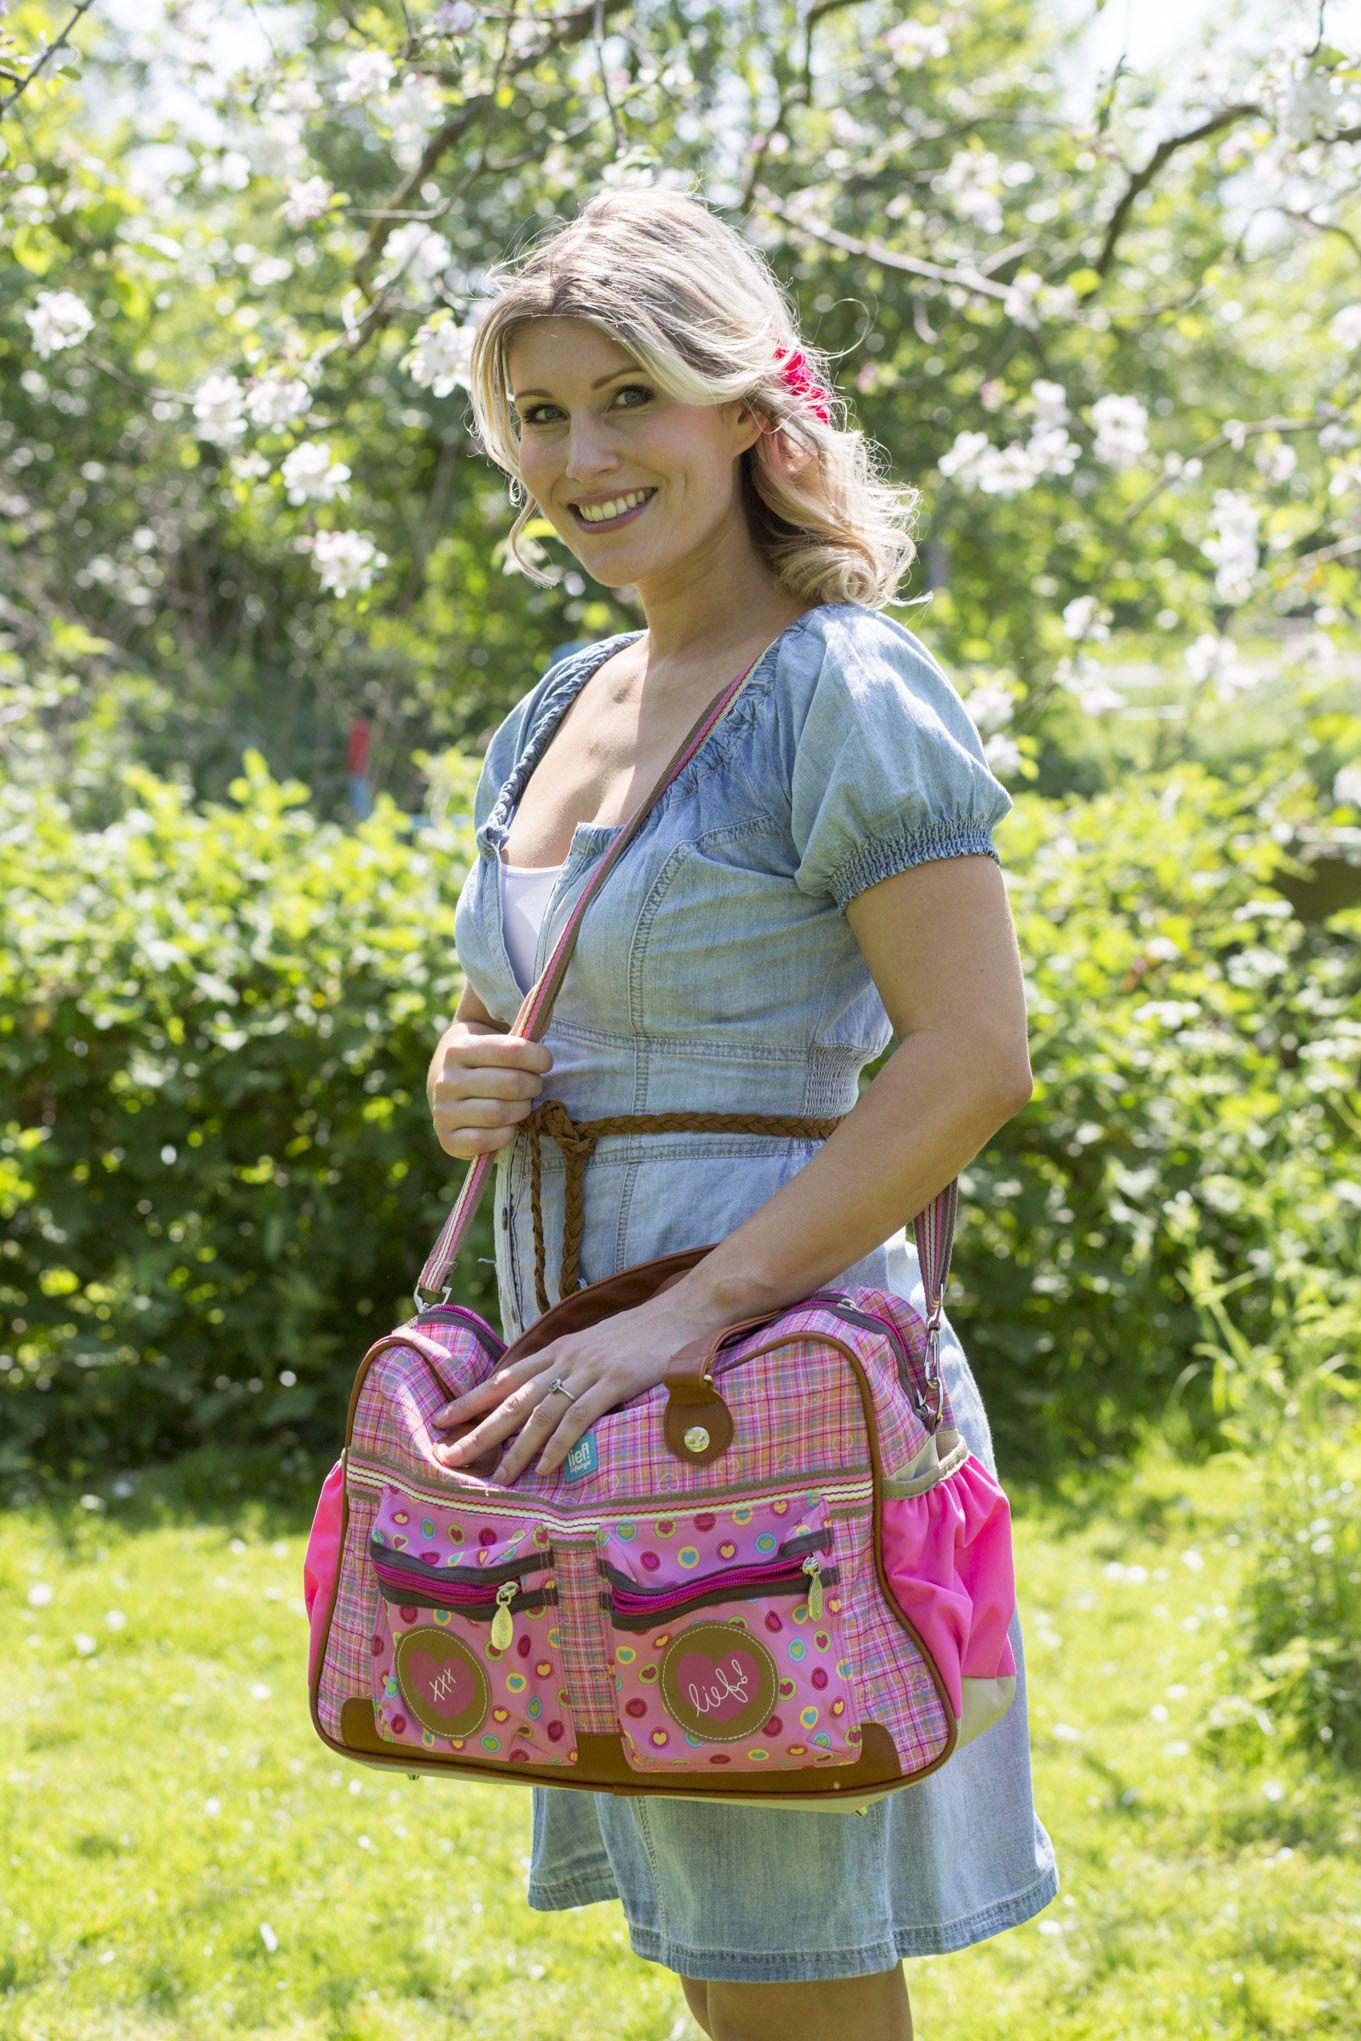 6f675a6cae7 lief! lifestyle luiertas roze diaper bag verzorgingstas pink /  #lieflifestyle #luiertas #verzorgingstas